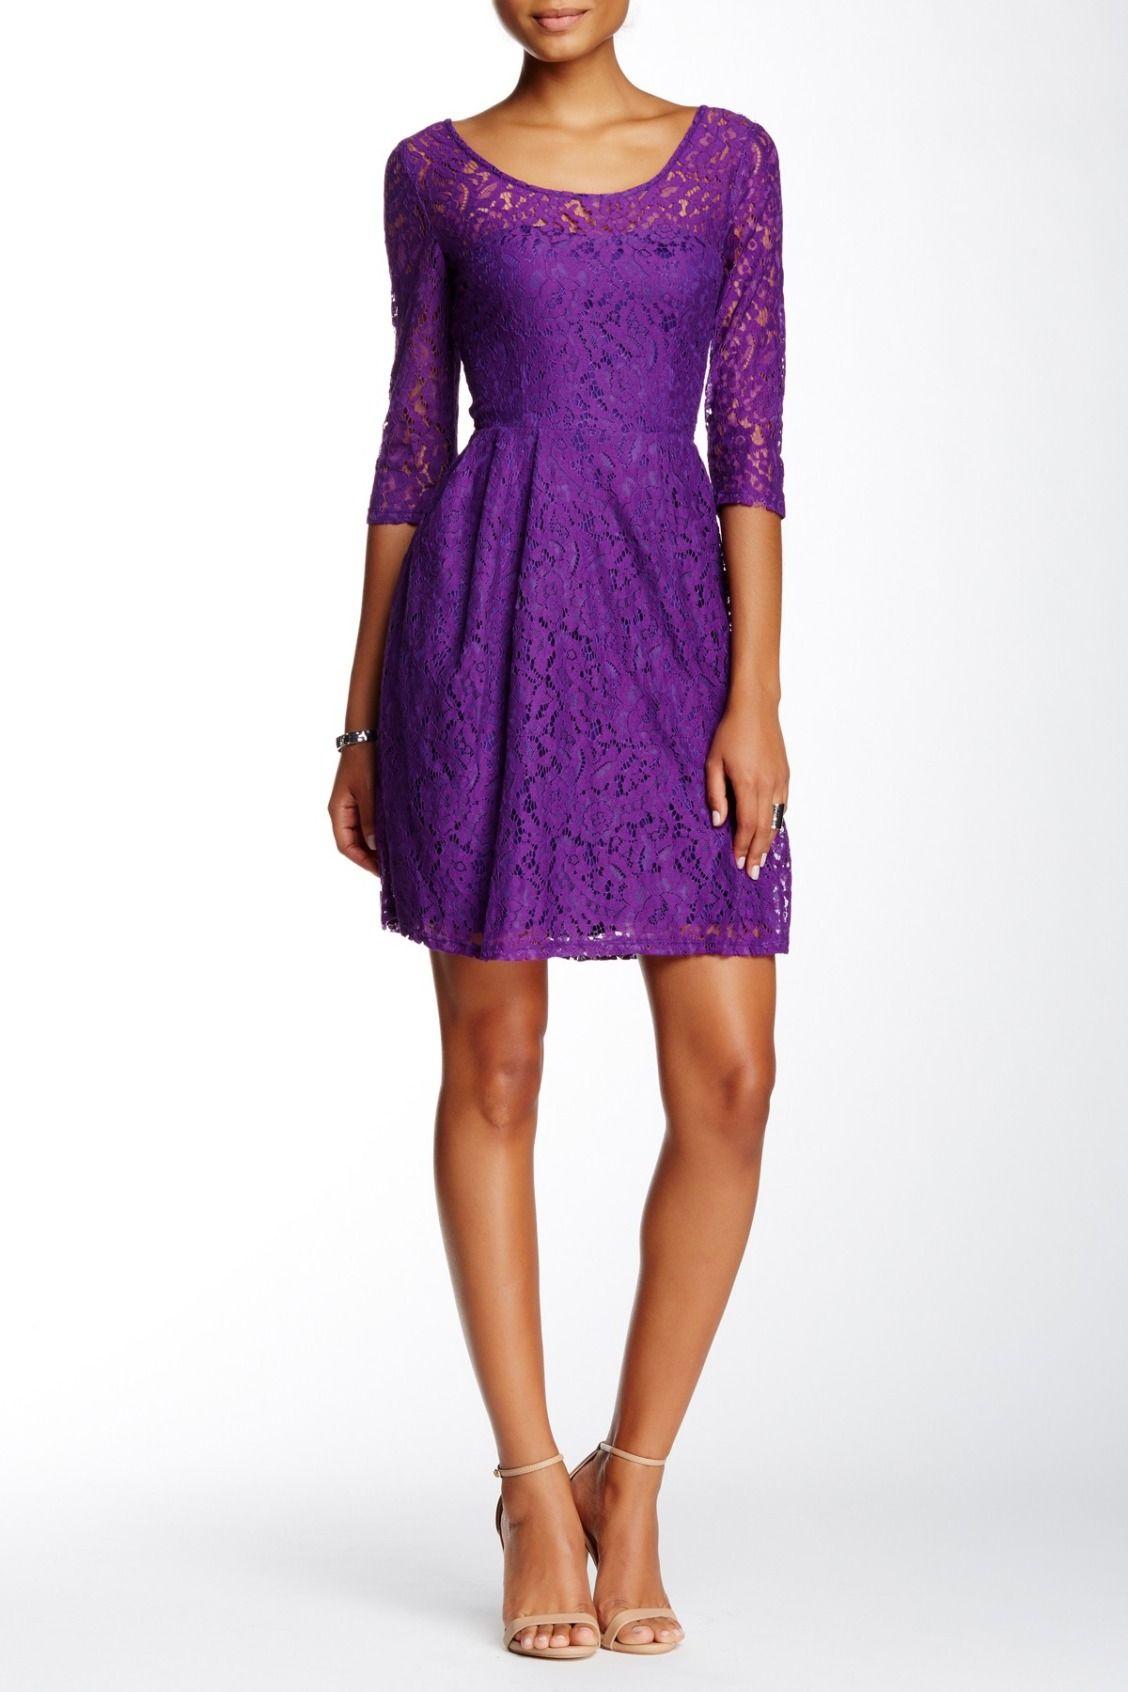 Betsey Johnson | Lace Skater Dress